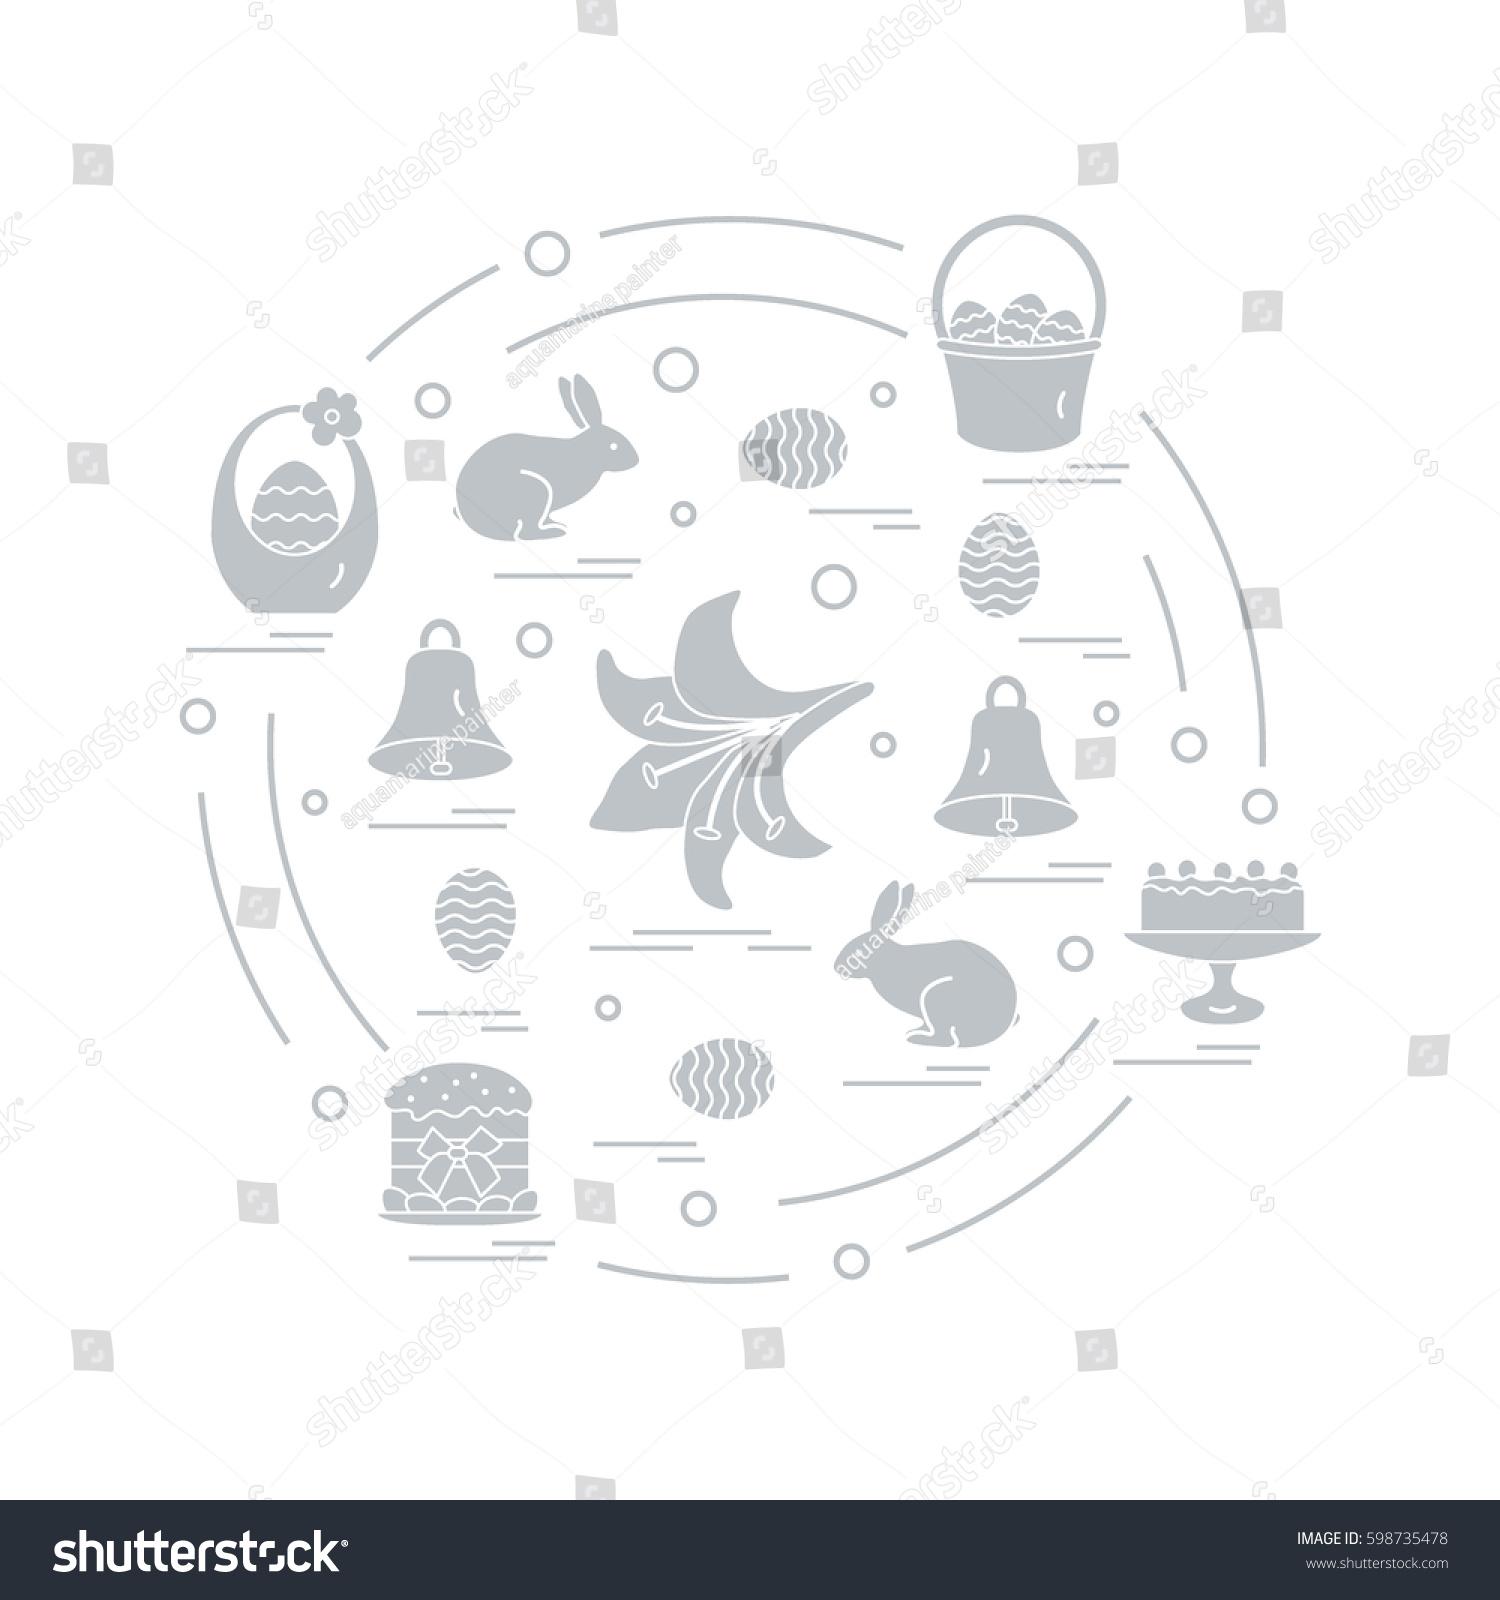 Cute vector illustration different symbols easter stock vector cute vector illustration with different symbols for easter arranged in a circle including icons of buycottarizona